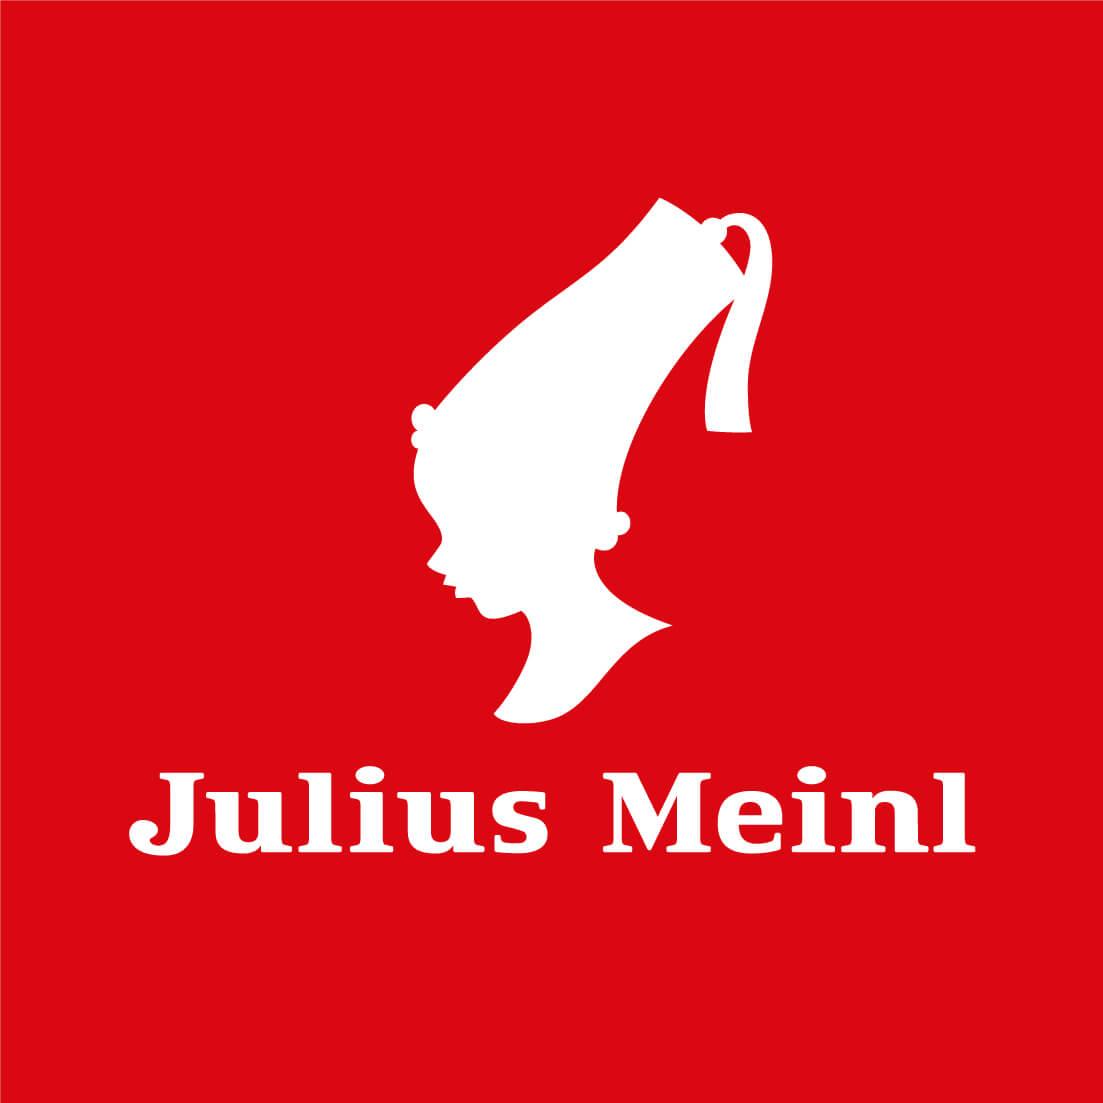 Julius Meinl Kaffee Logo